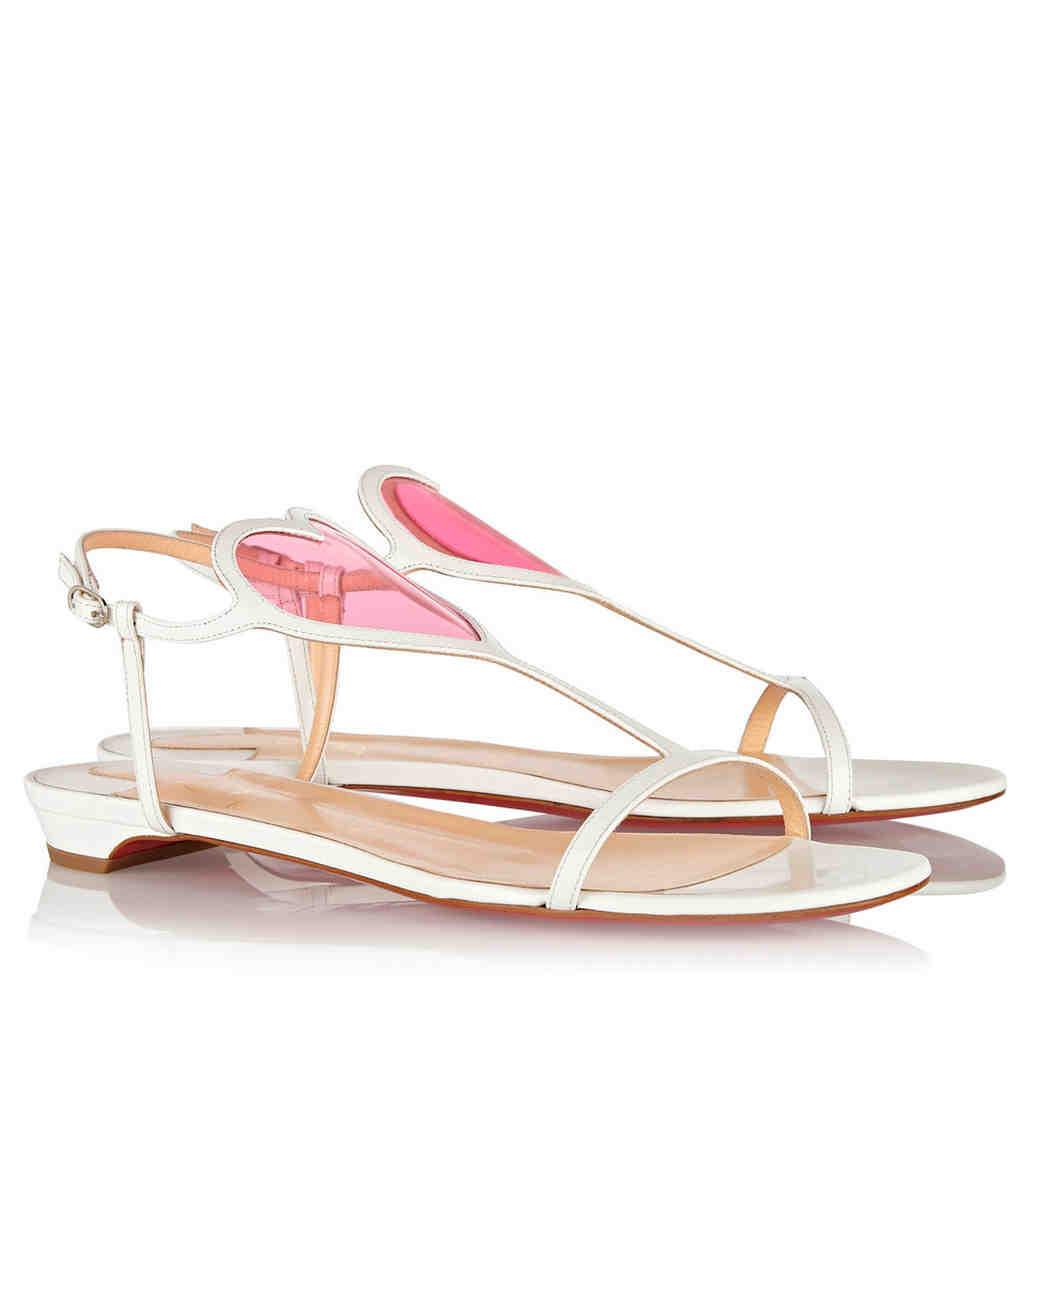 summer-wedding-shoes-christian-louboutin-patent-sandals-0515.jpg